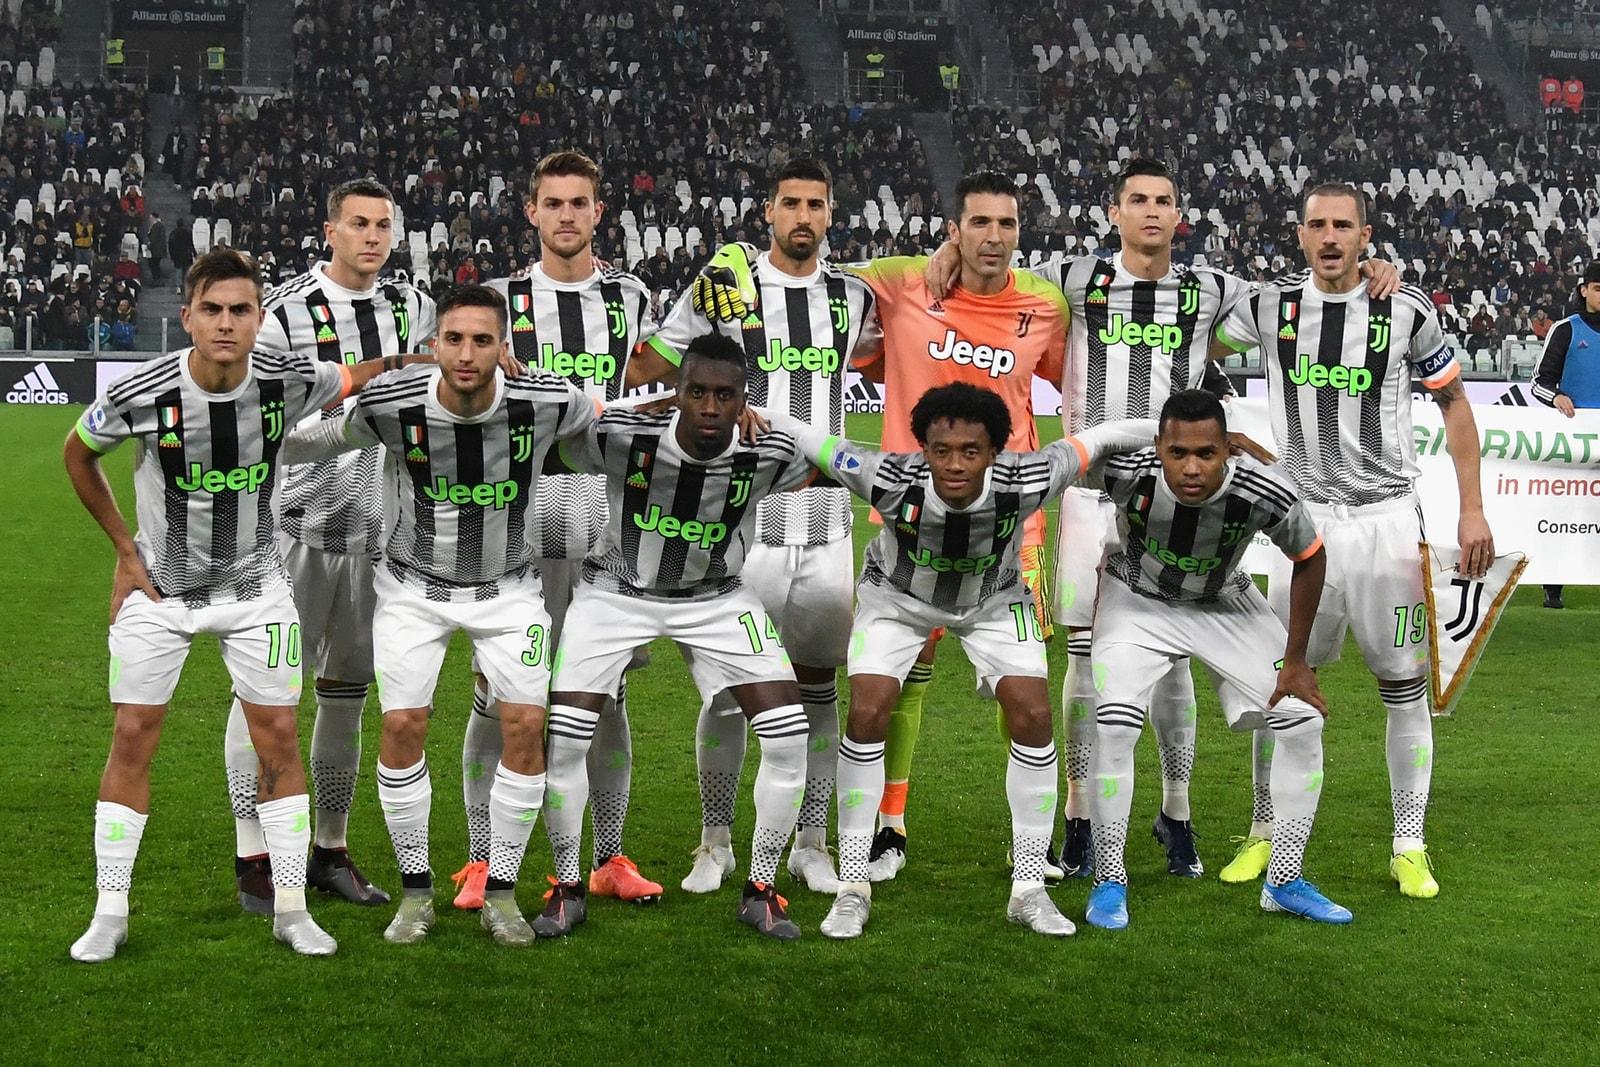 Palace Juventus Cristiano Ronaldo Genoa Lev Tanju Mundial Reactions Football Insider Author Vintage Football Shirts Collaborations